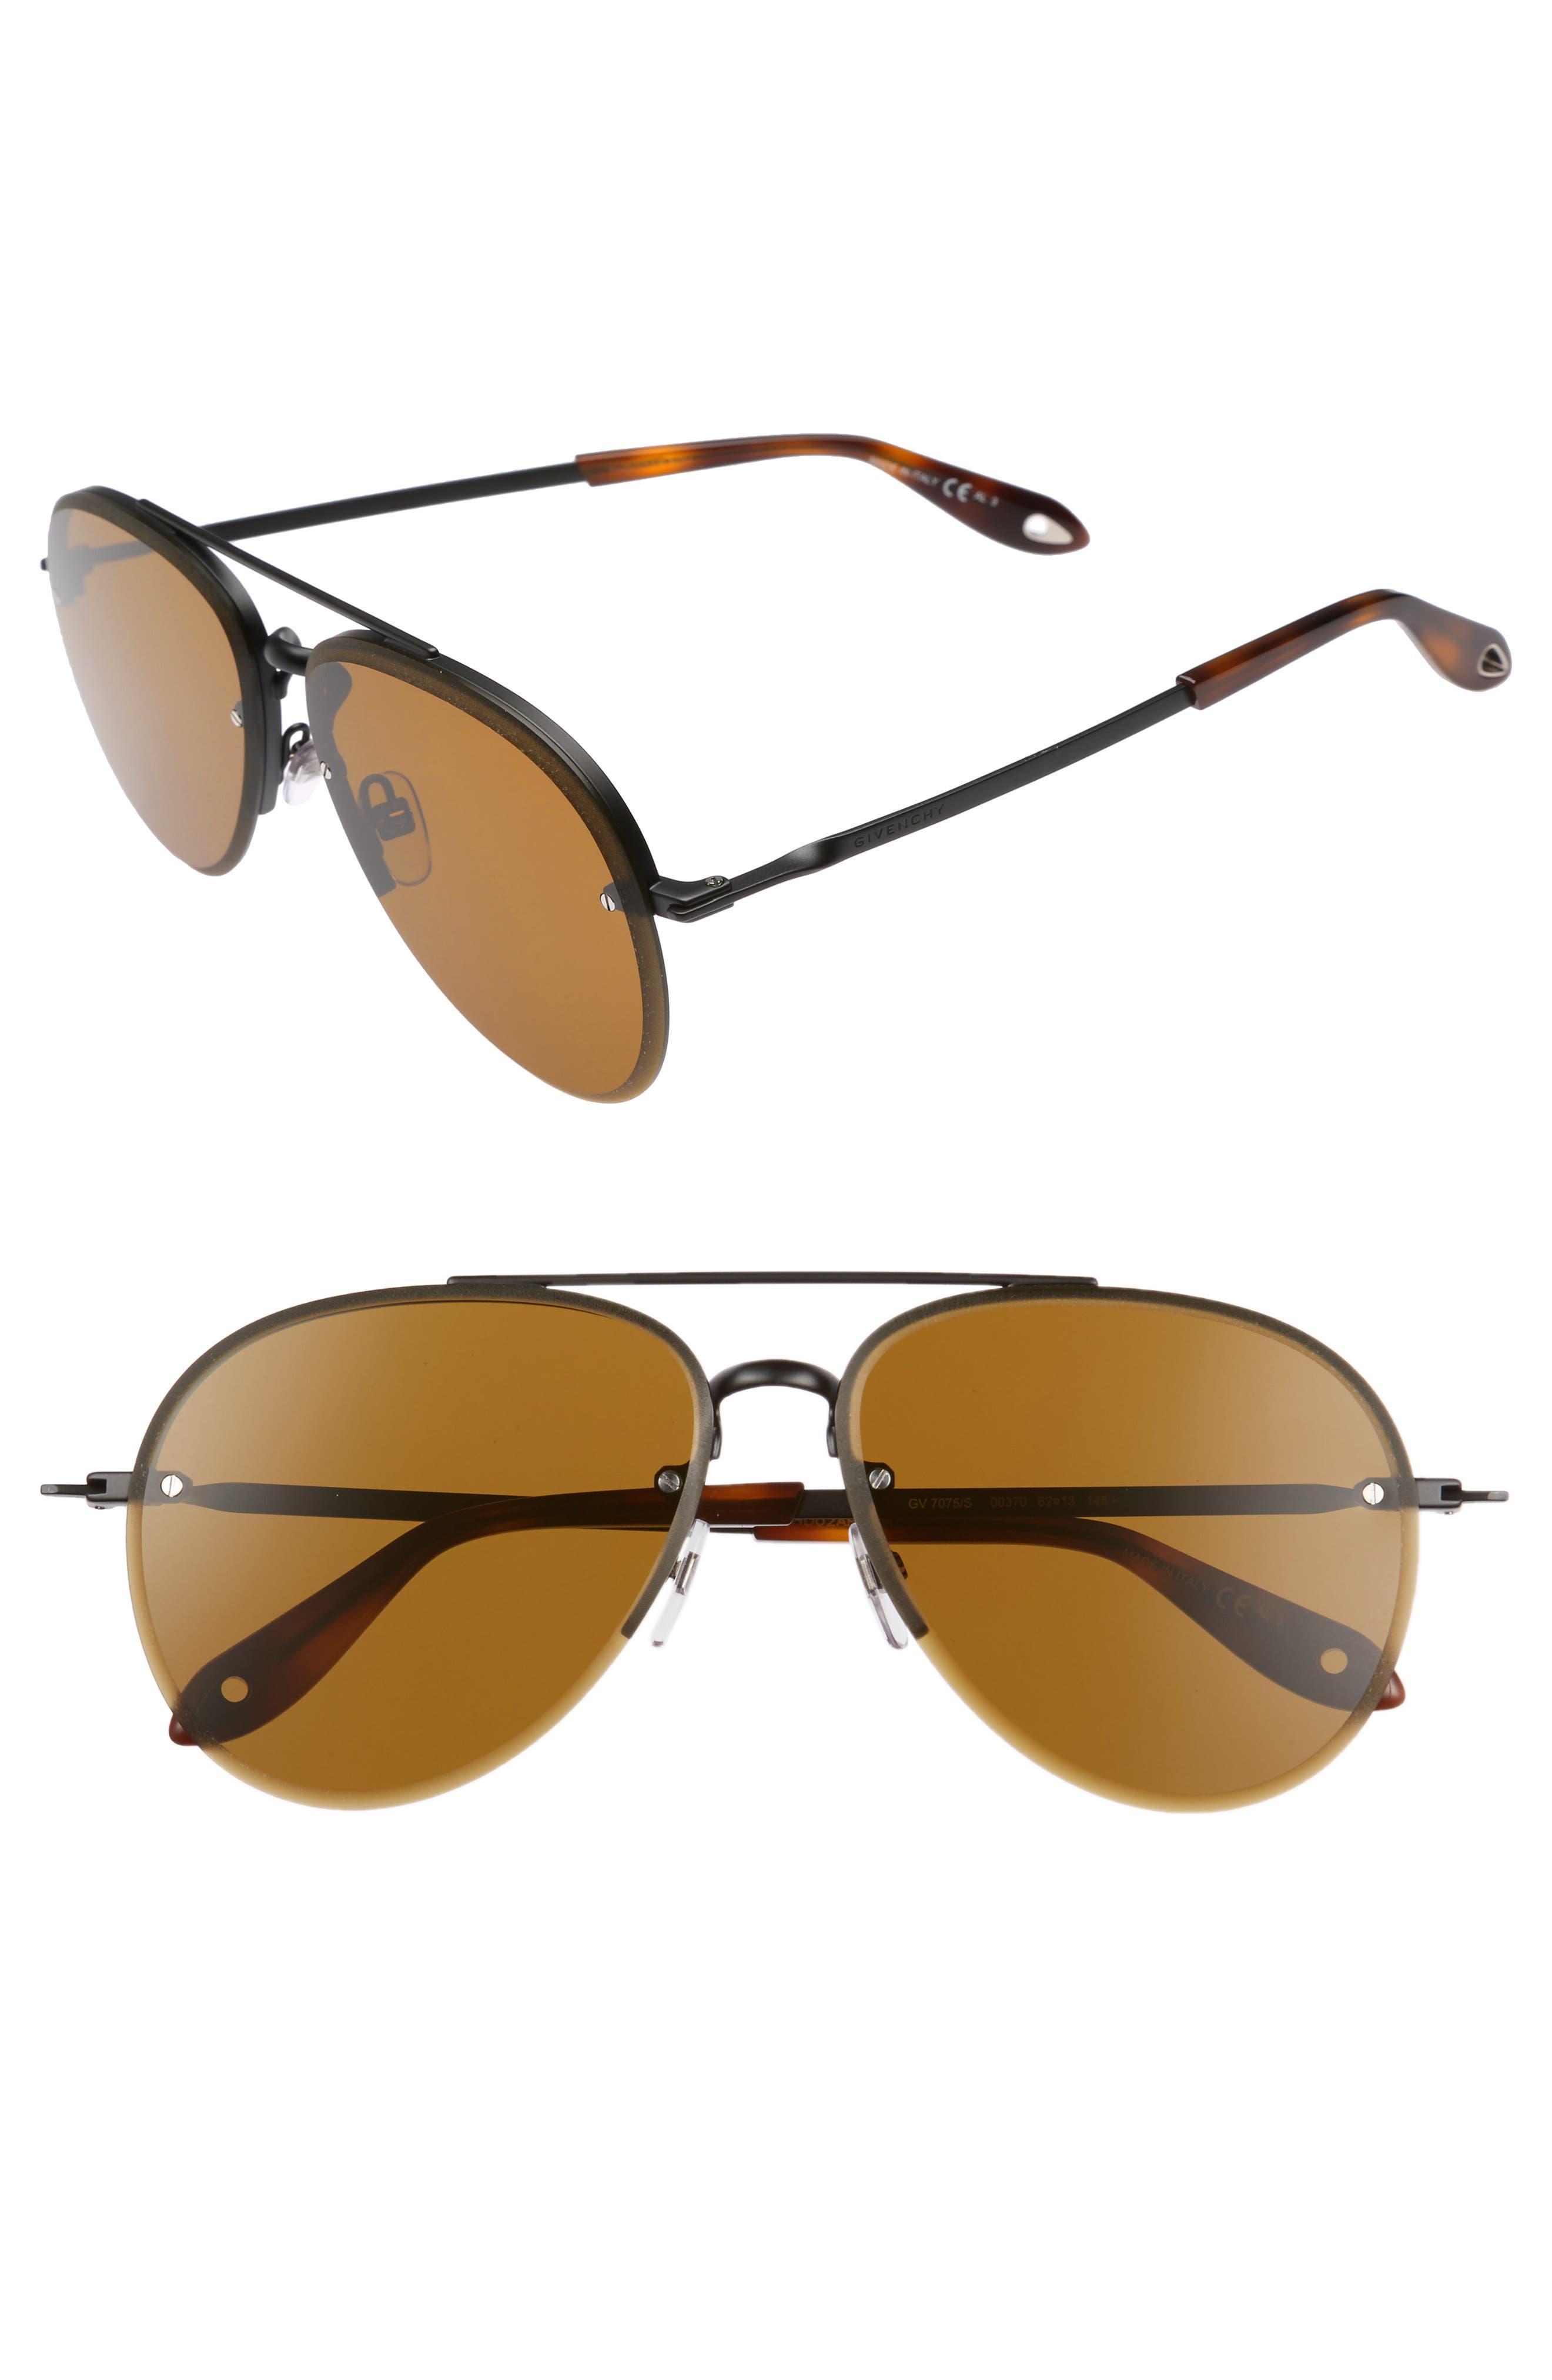 Main Image - Givenchy 62mm Oversize Aviator Sunglasses